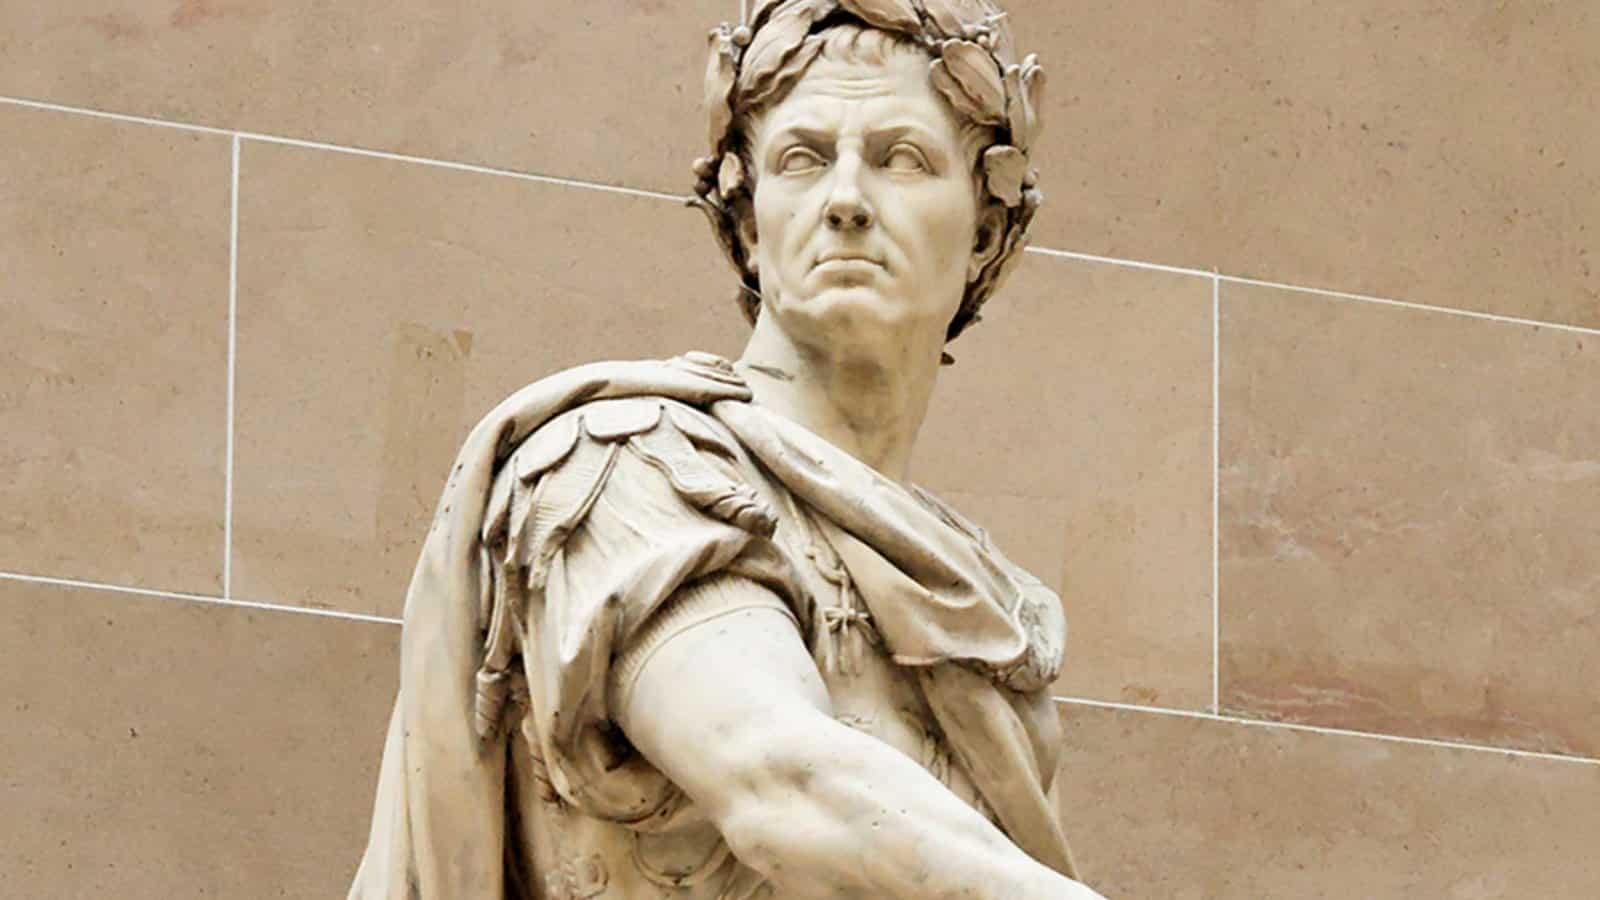 Estátua da figura historica